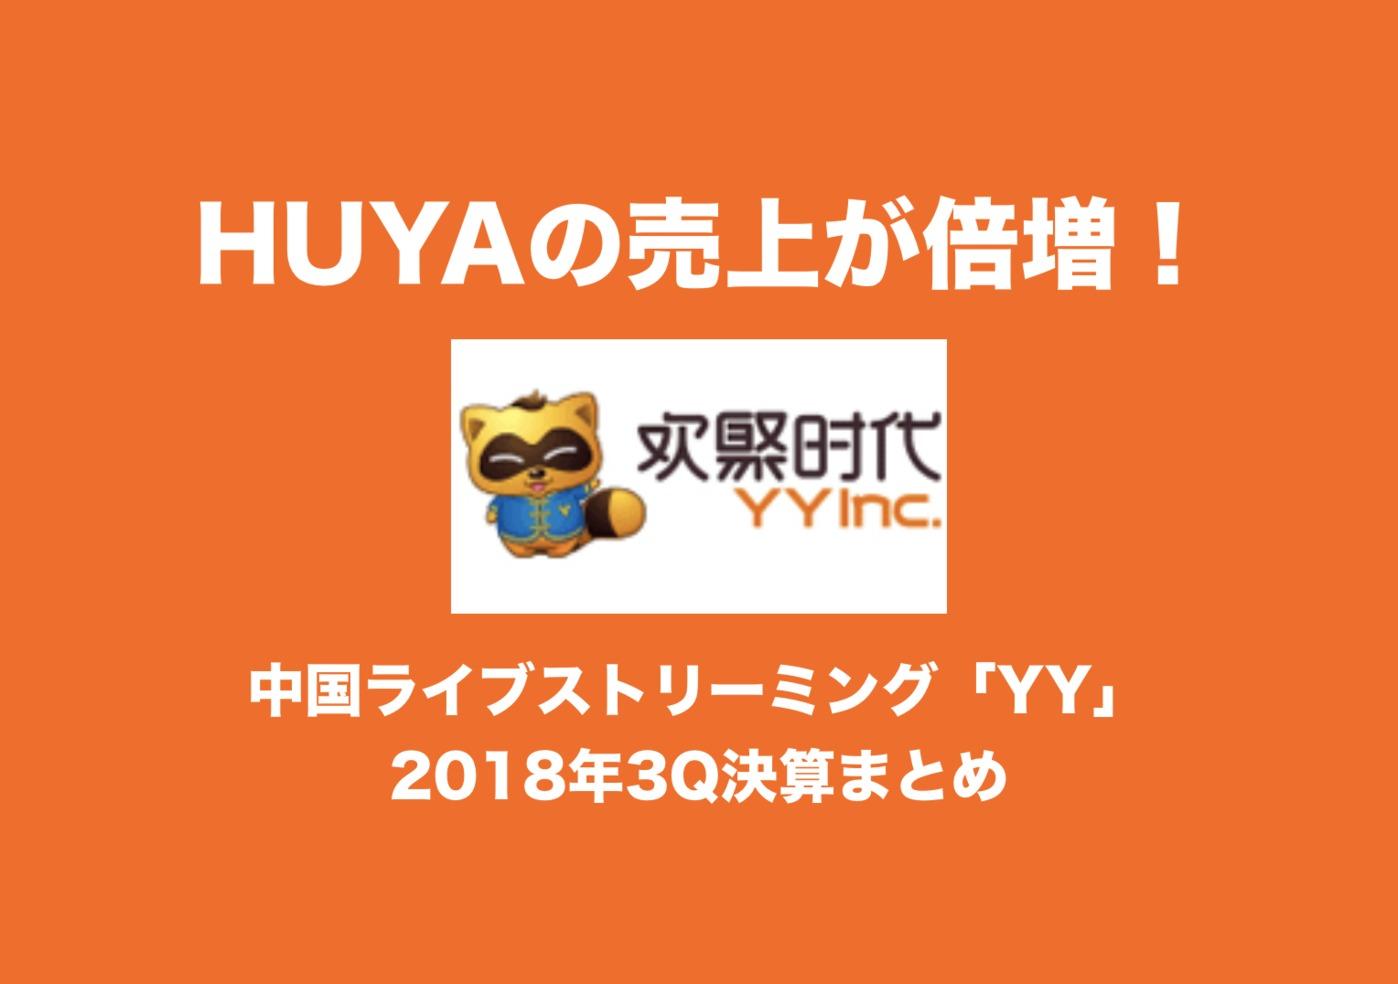 「HUYA」の売上が倍増!中国ライブストリーミング「YY Inc.」2018年3Q決算まとめ